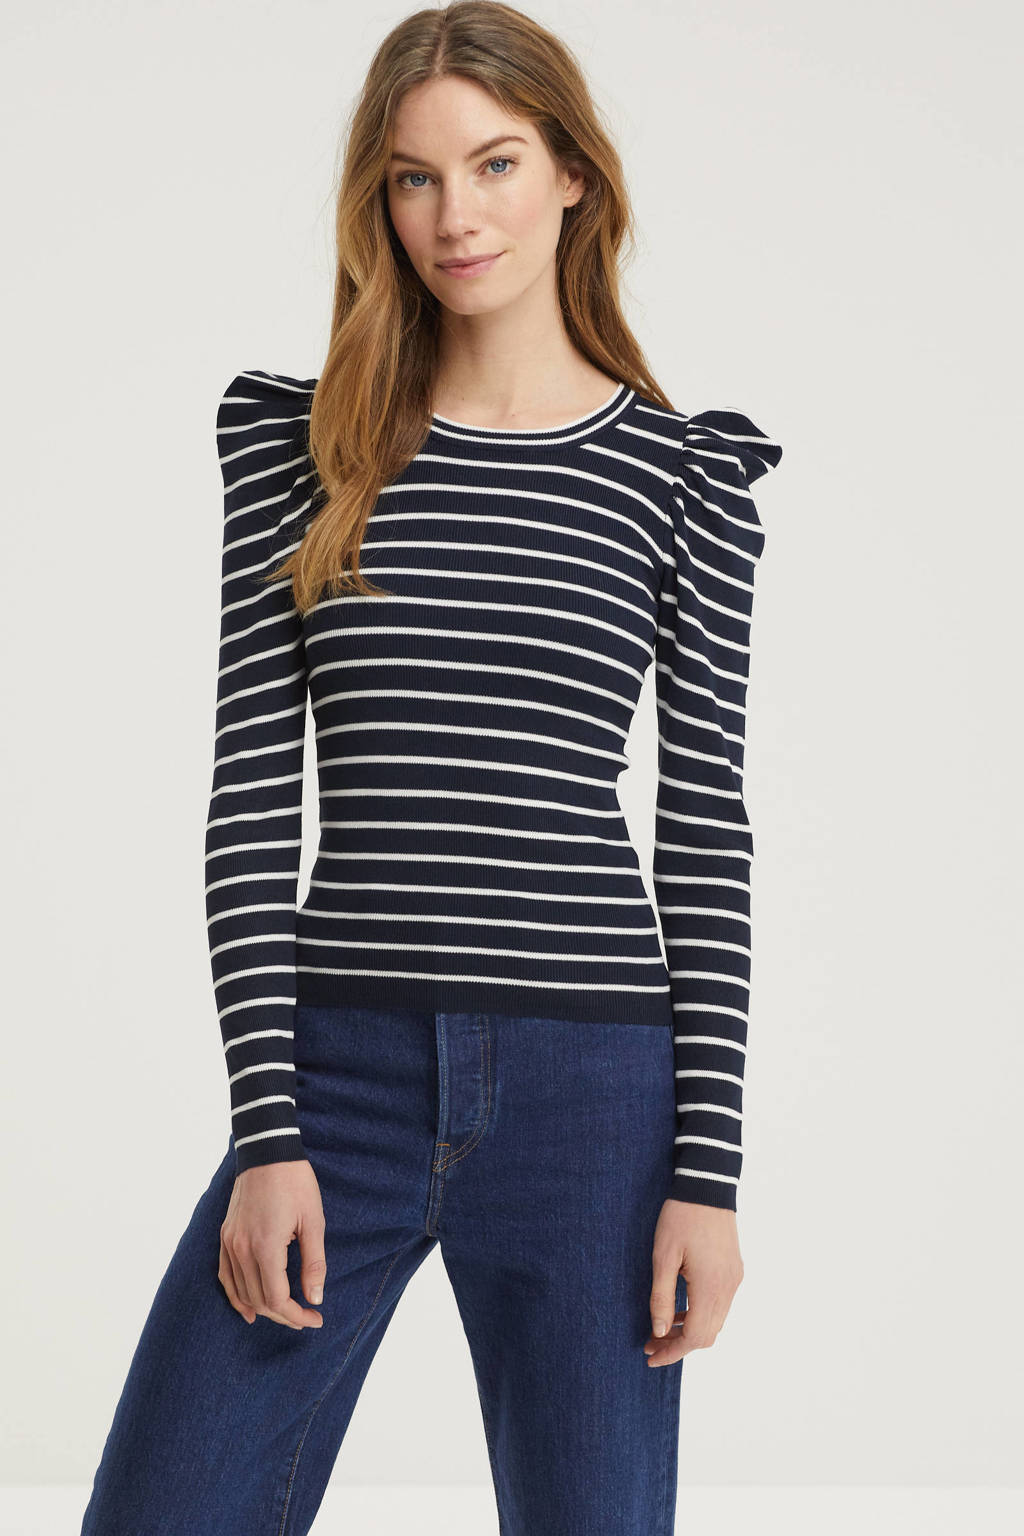 JACQUELINE DE YONG gestreepte trui donkerblauw/wit, Donkerblauw/wit